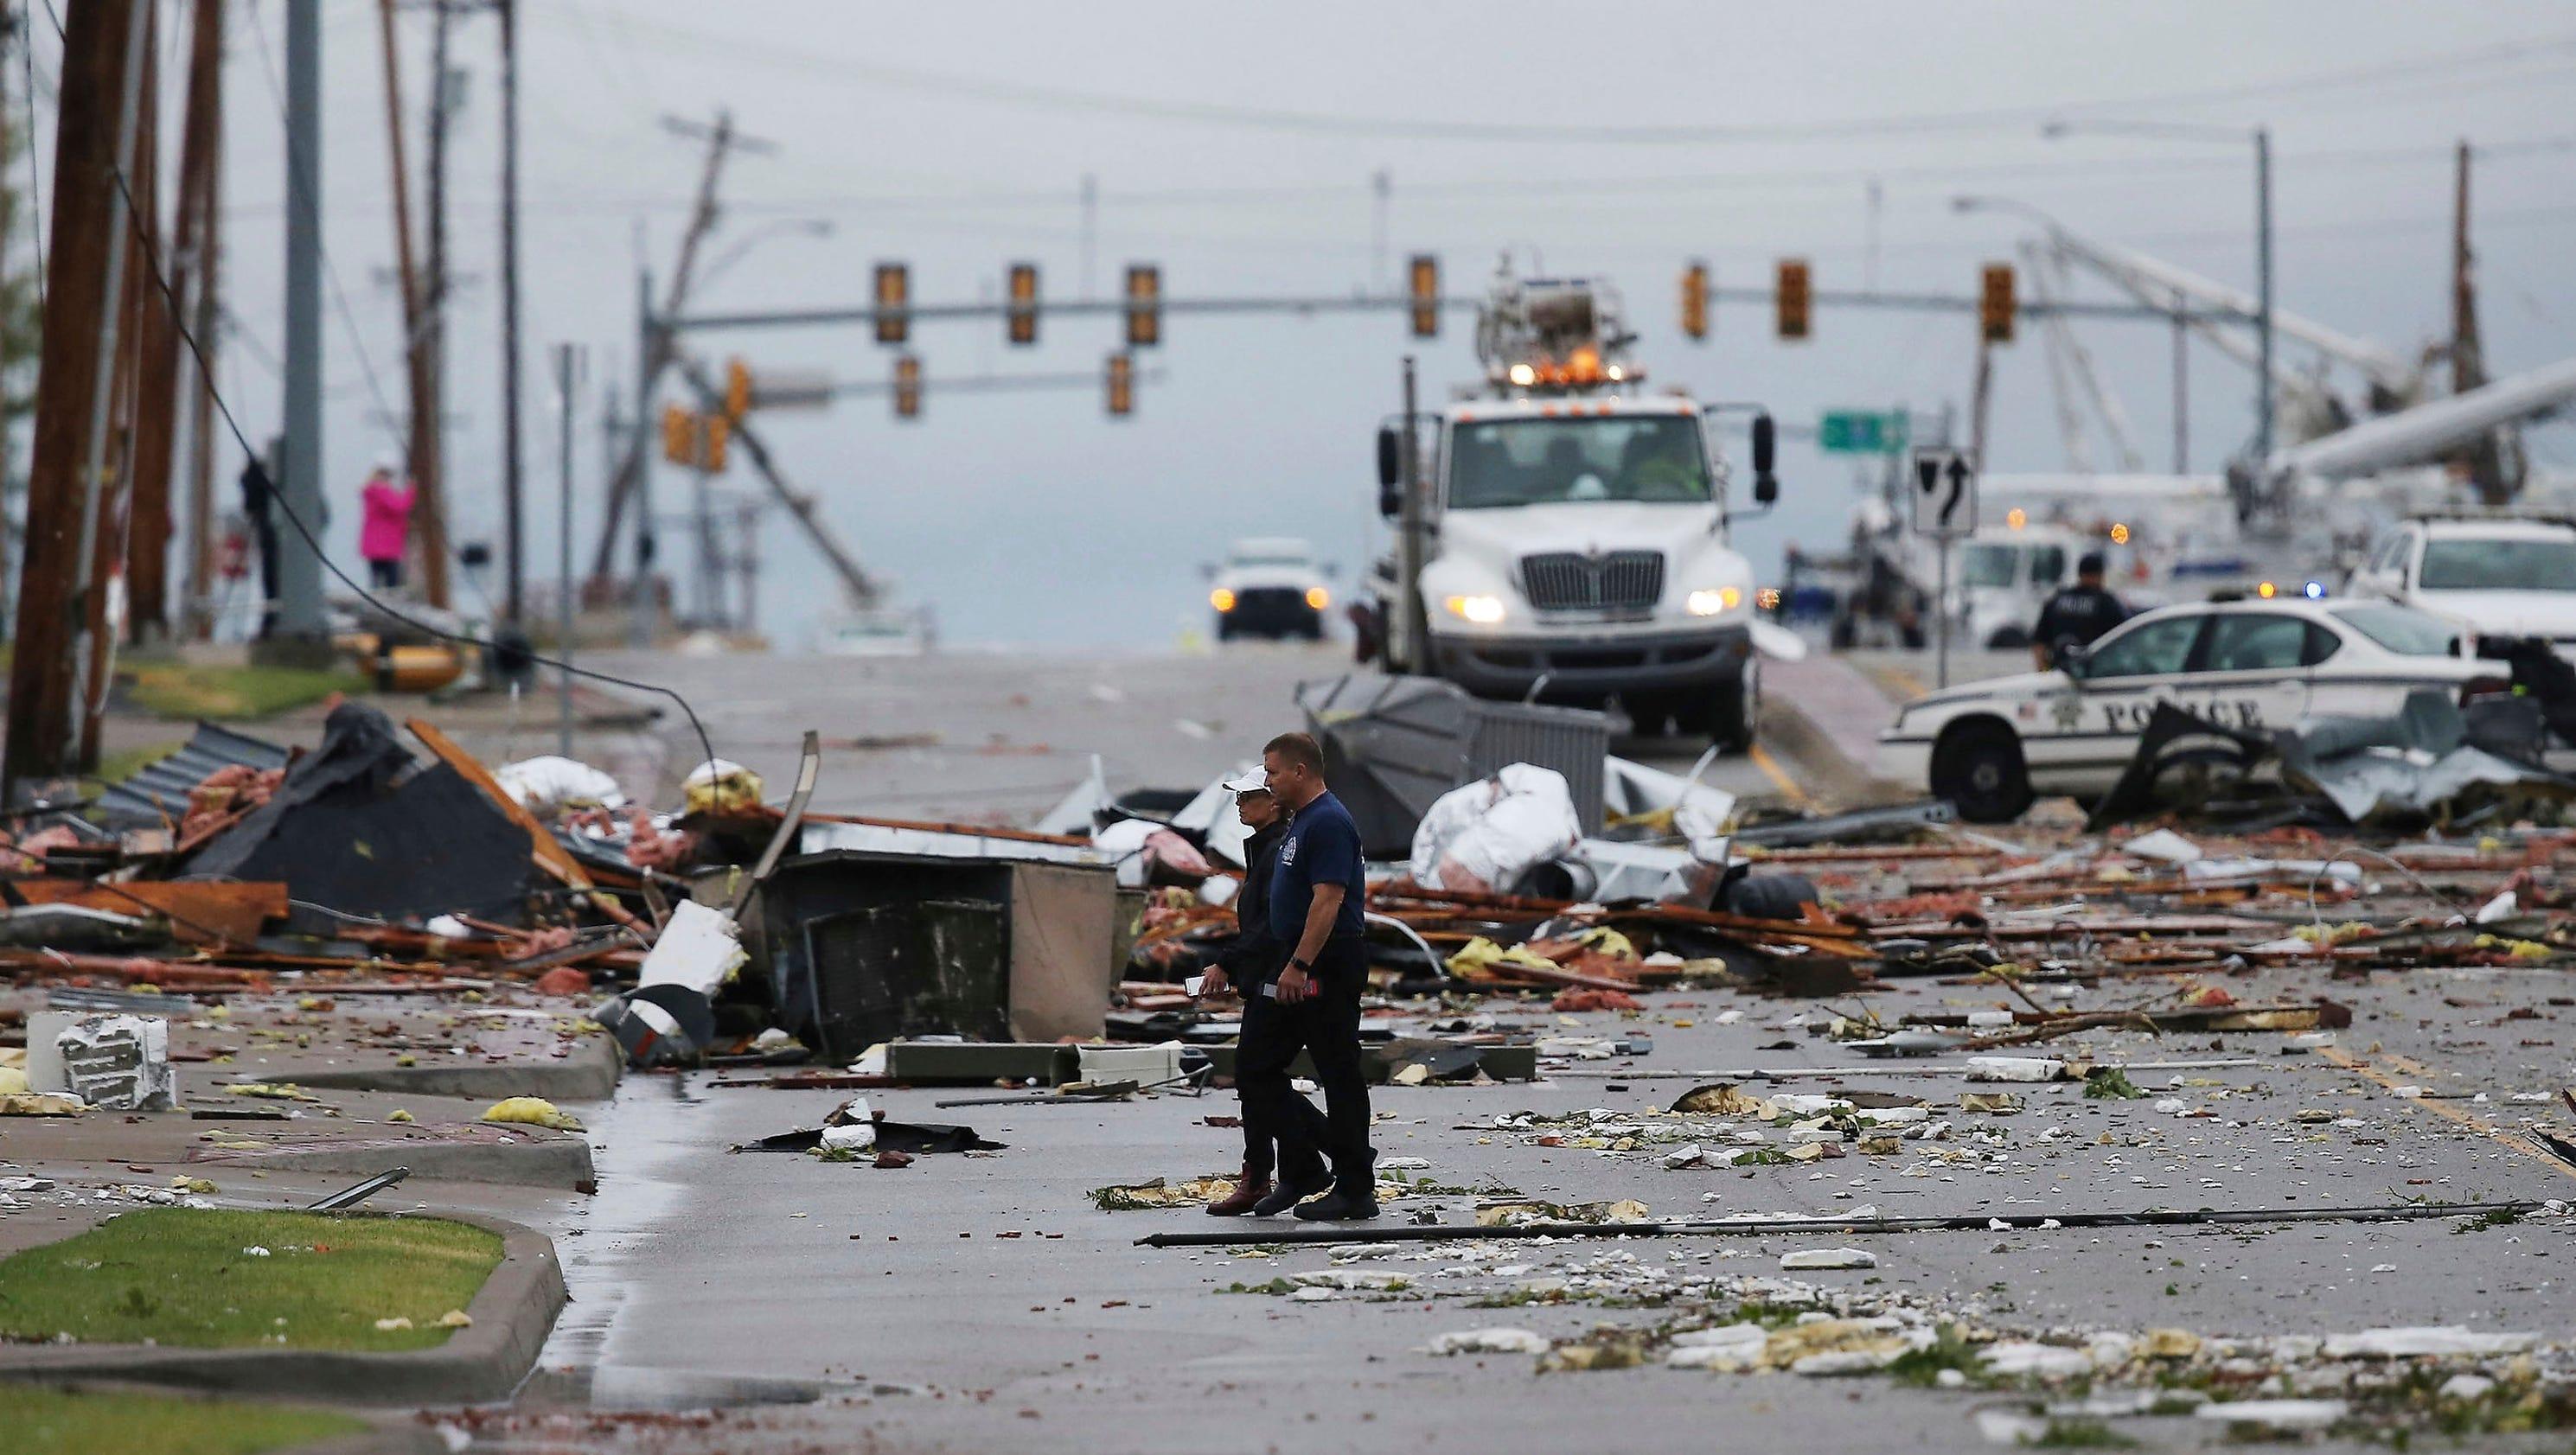 Tornado In Oklahoma Today Video